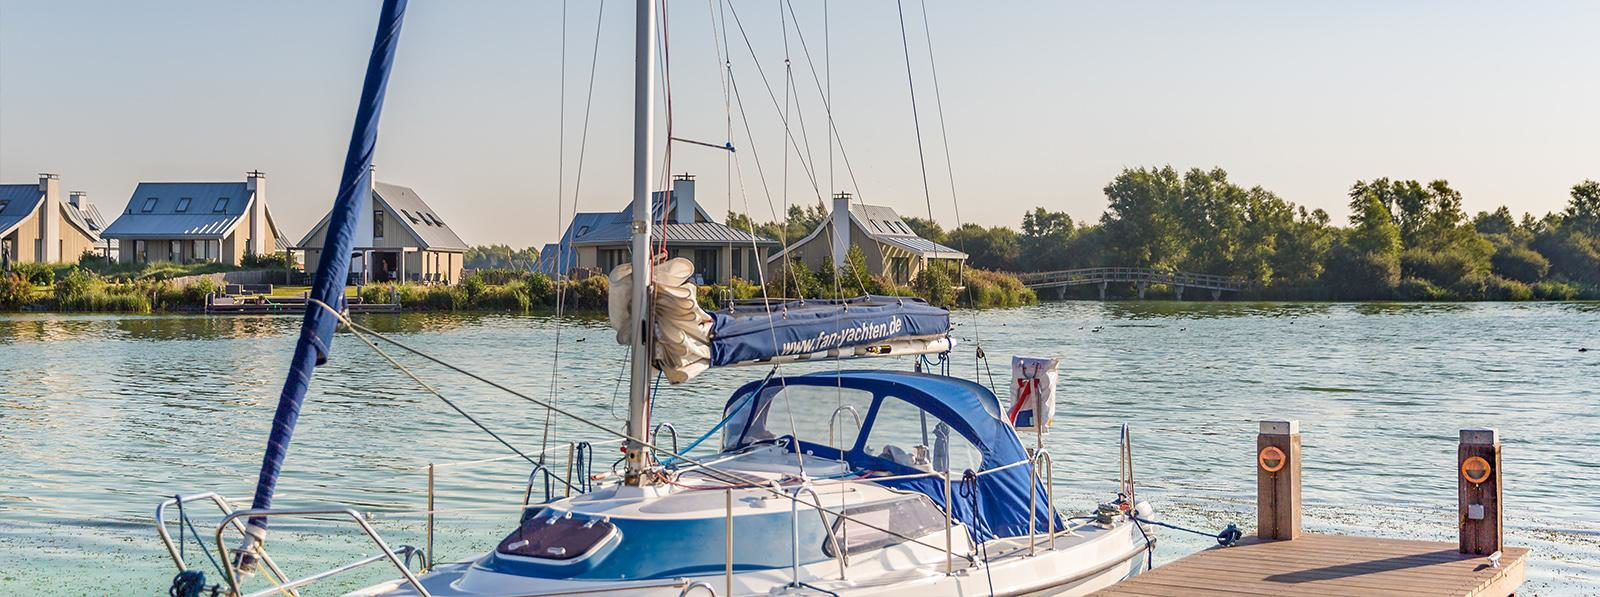 Yachthafen Marina Oesterdam